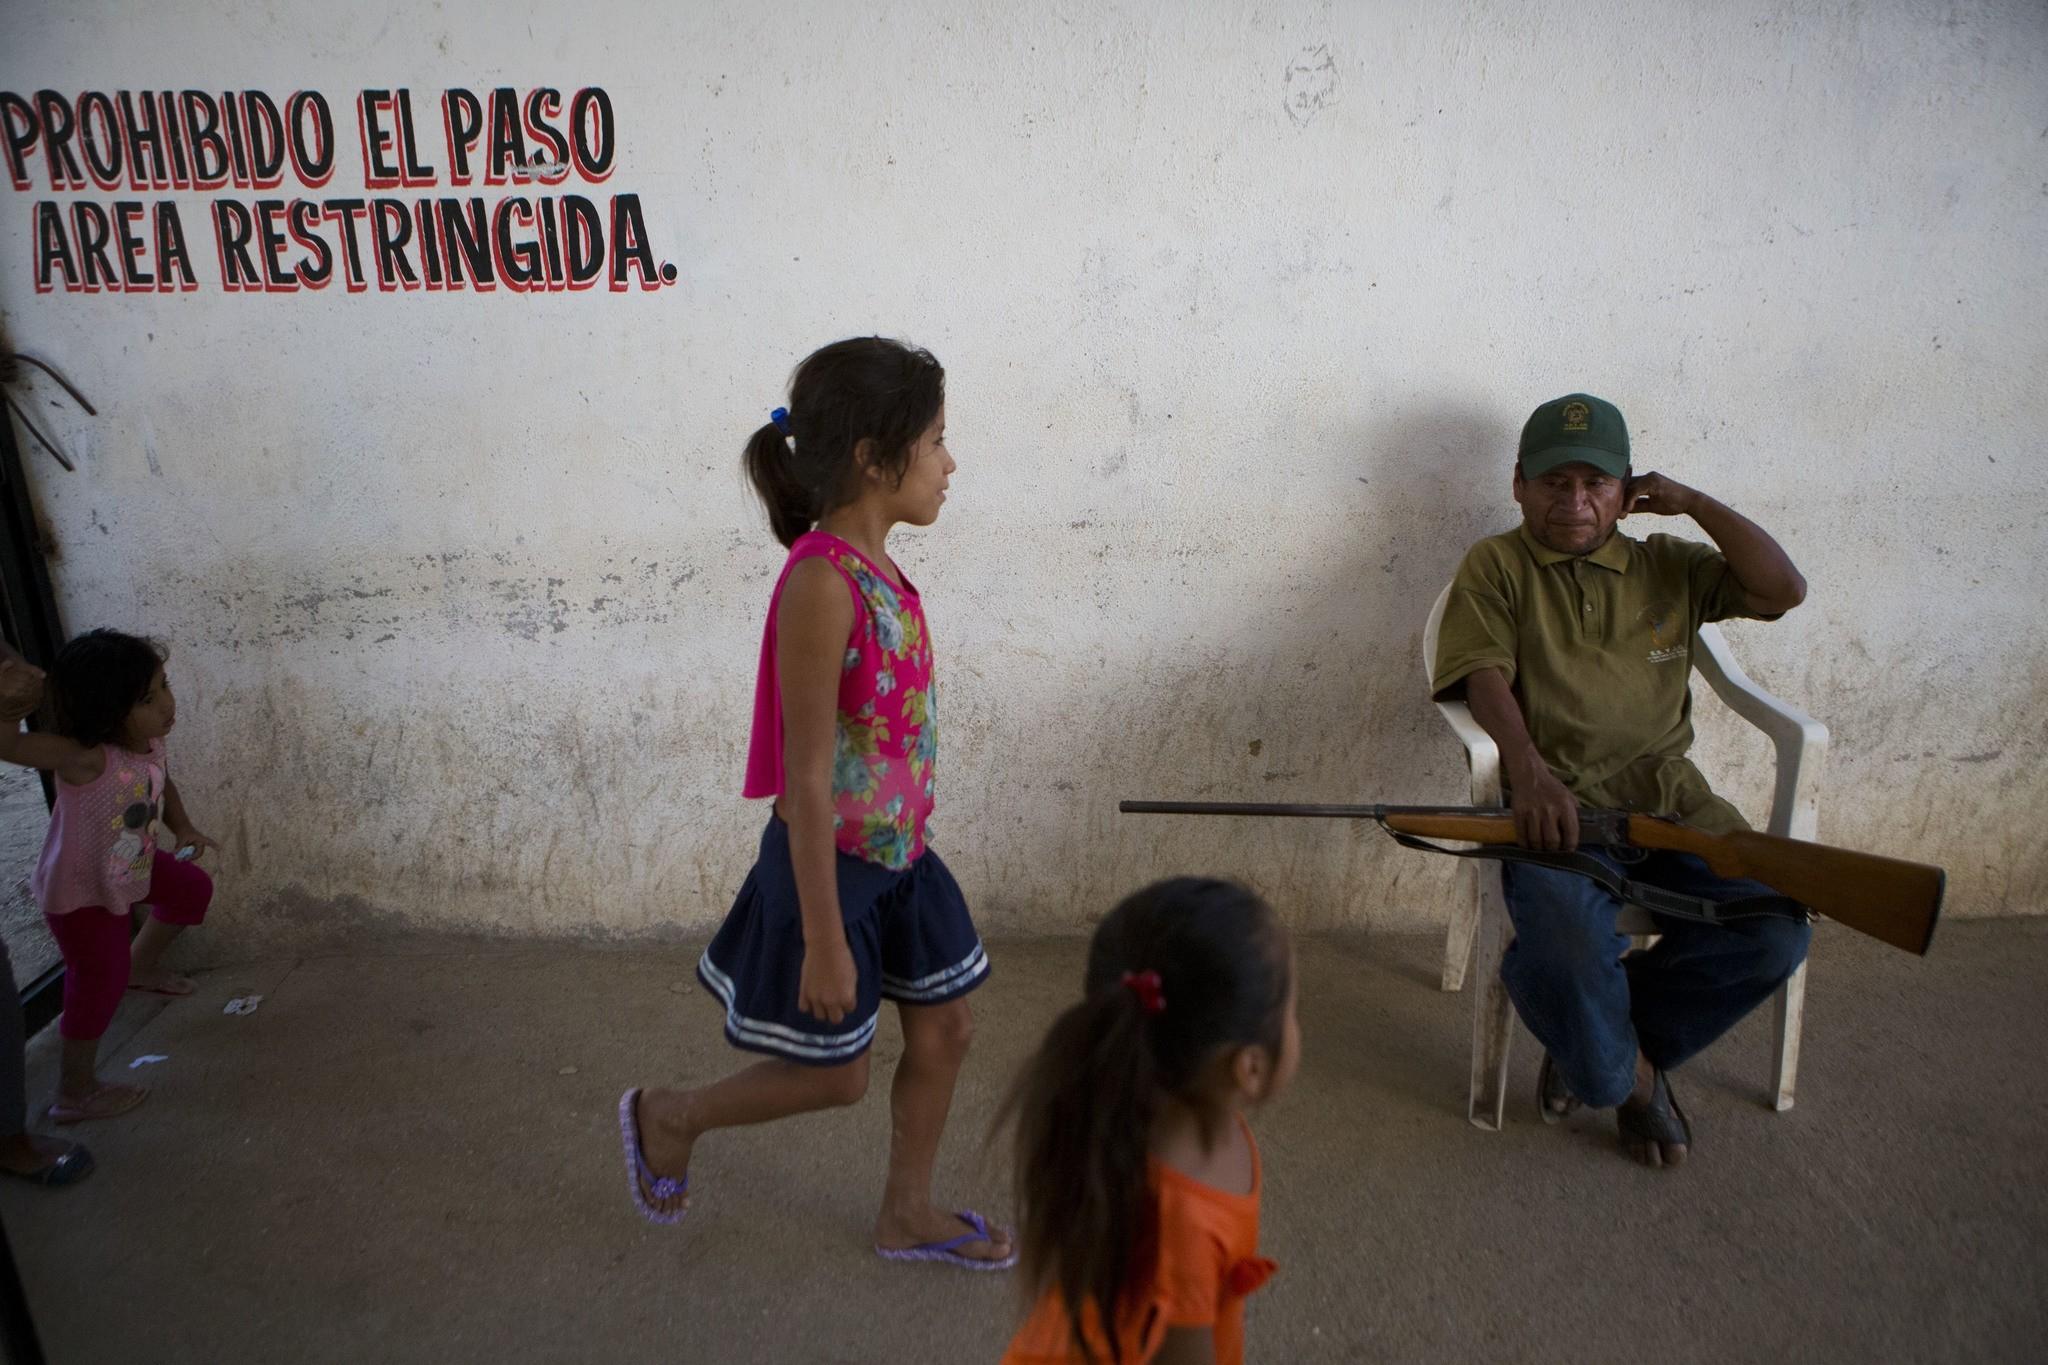 In this Feb. 4, 2018, photo, children walk past a ,community police, officer at the vigilante force's base in Ayutla de los Libres, Guerrero state, Mexico. (AP Photo)